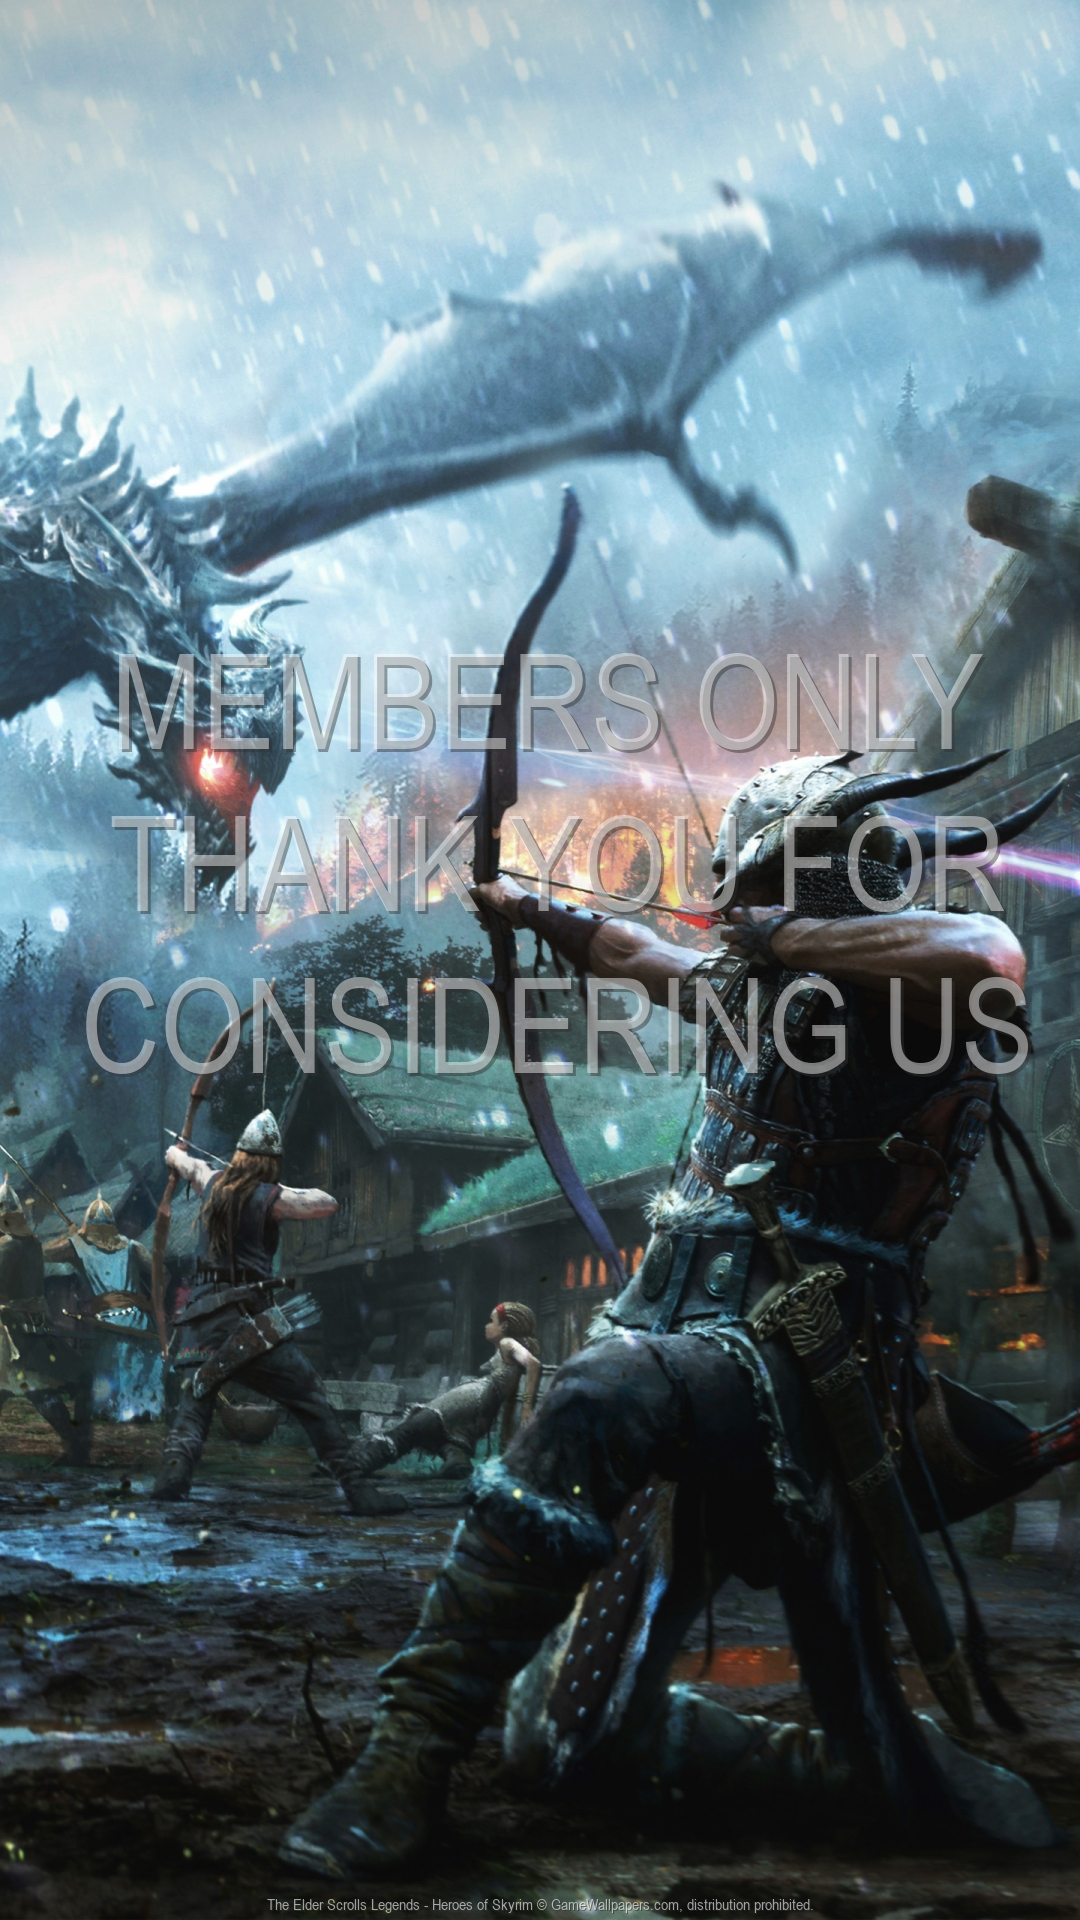 The Elder Scrolls: Legends - Heroes of Skyrim 1920x1080 Mobile wallpaper or background 01